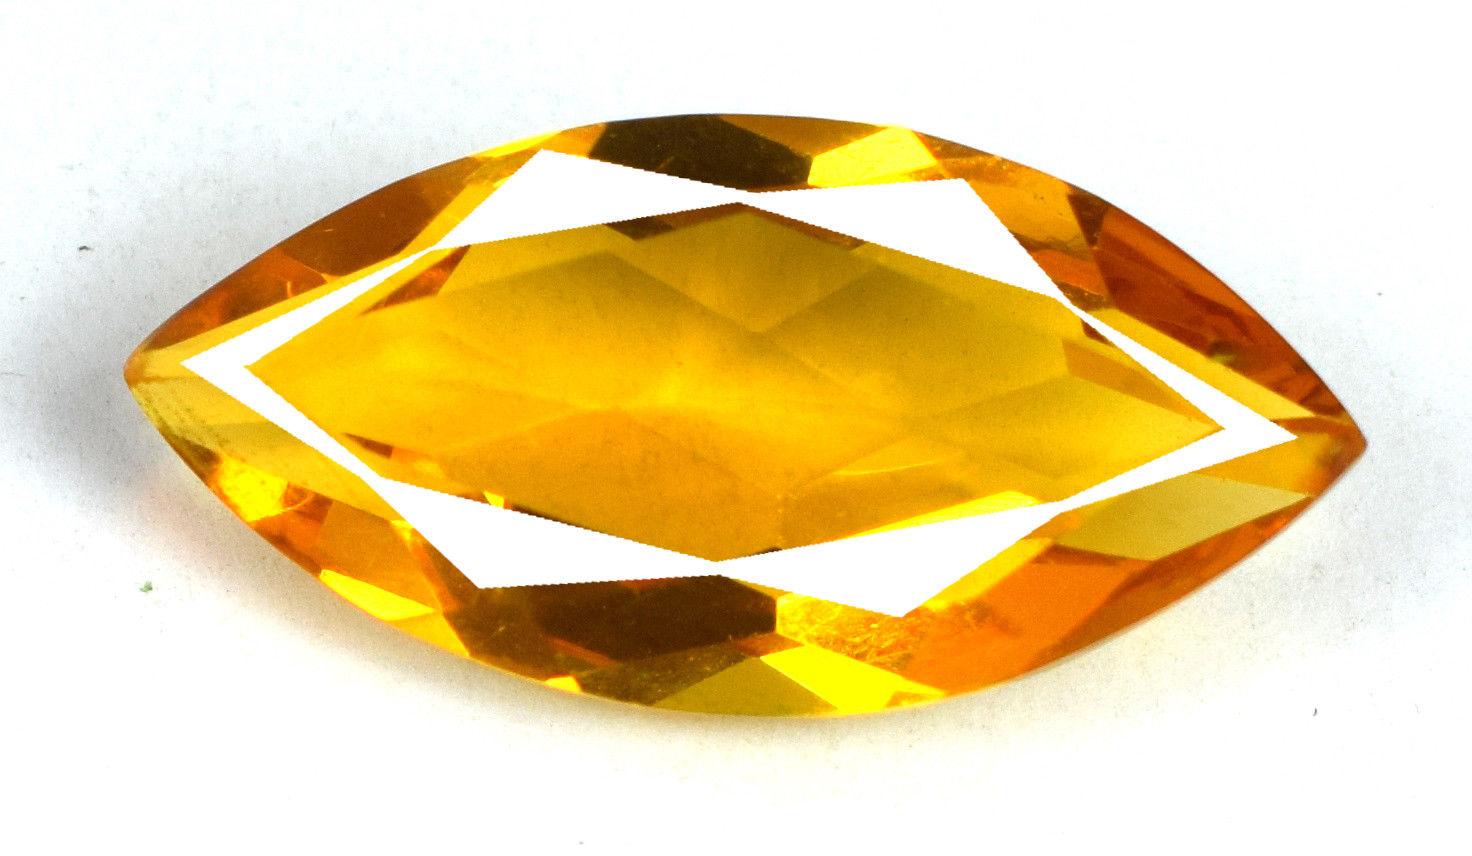 Natural 10 x 5 mm Marquise Loose Garnet Gemstone